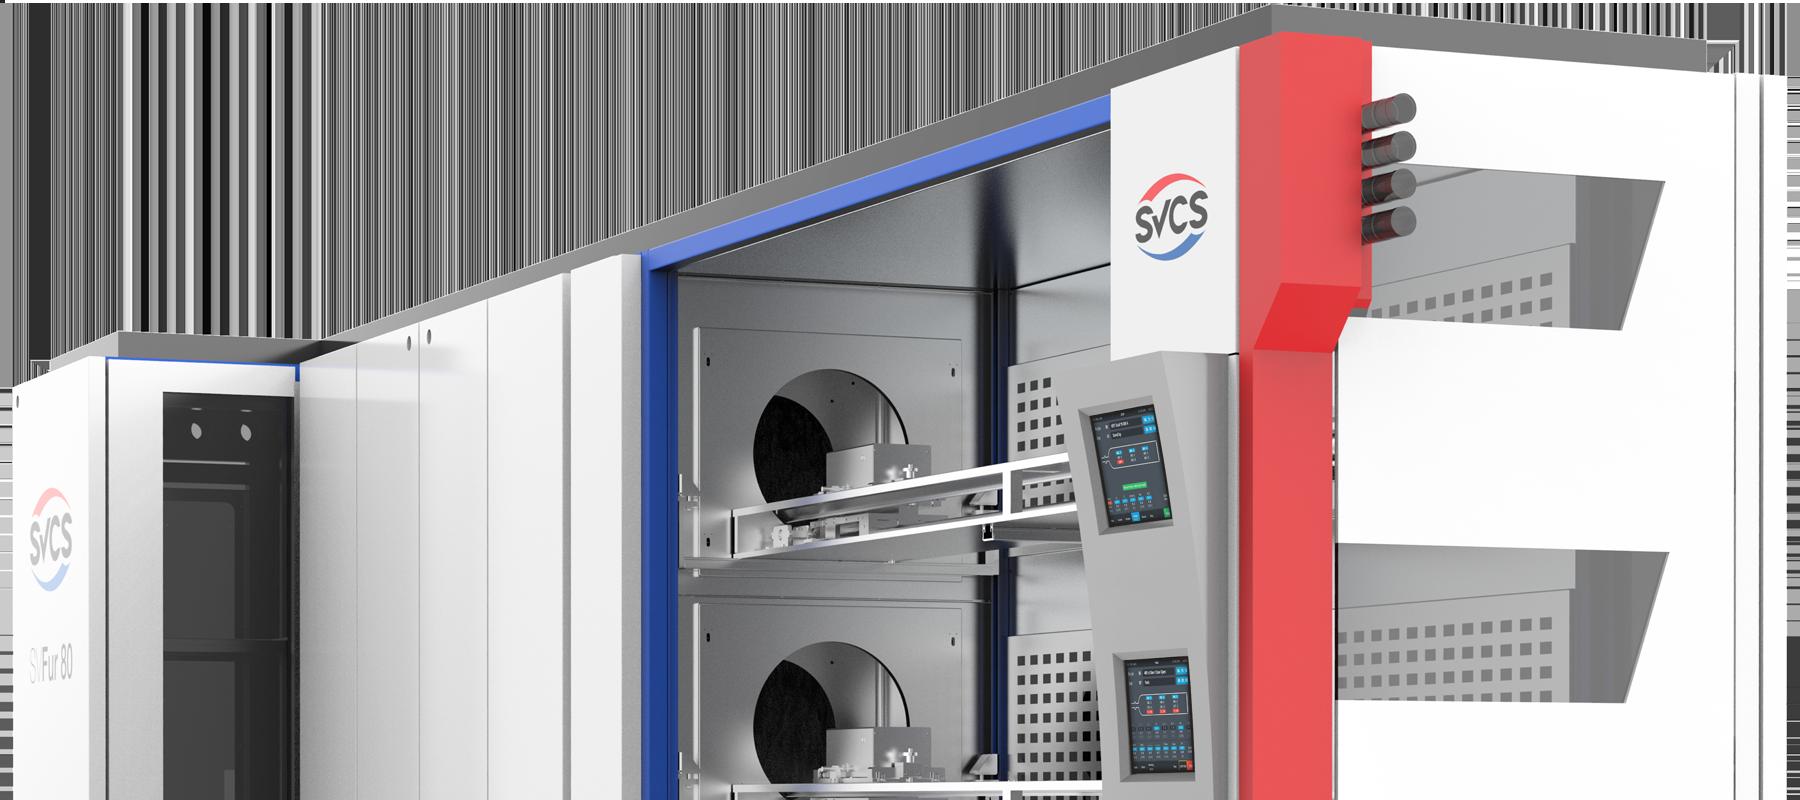 https://empbv.com/wp-content/uploads/2020/05/scvs-ln_horizontal-diffusion-furnace_web-1.png